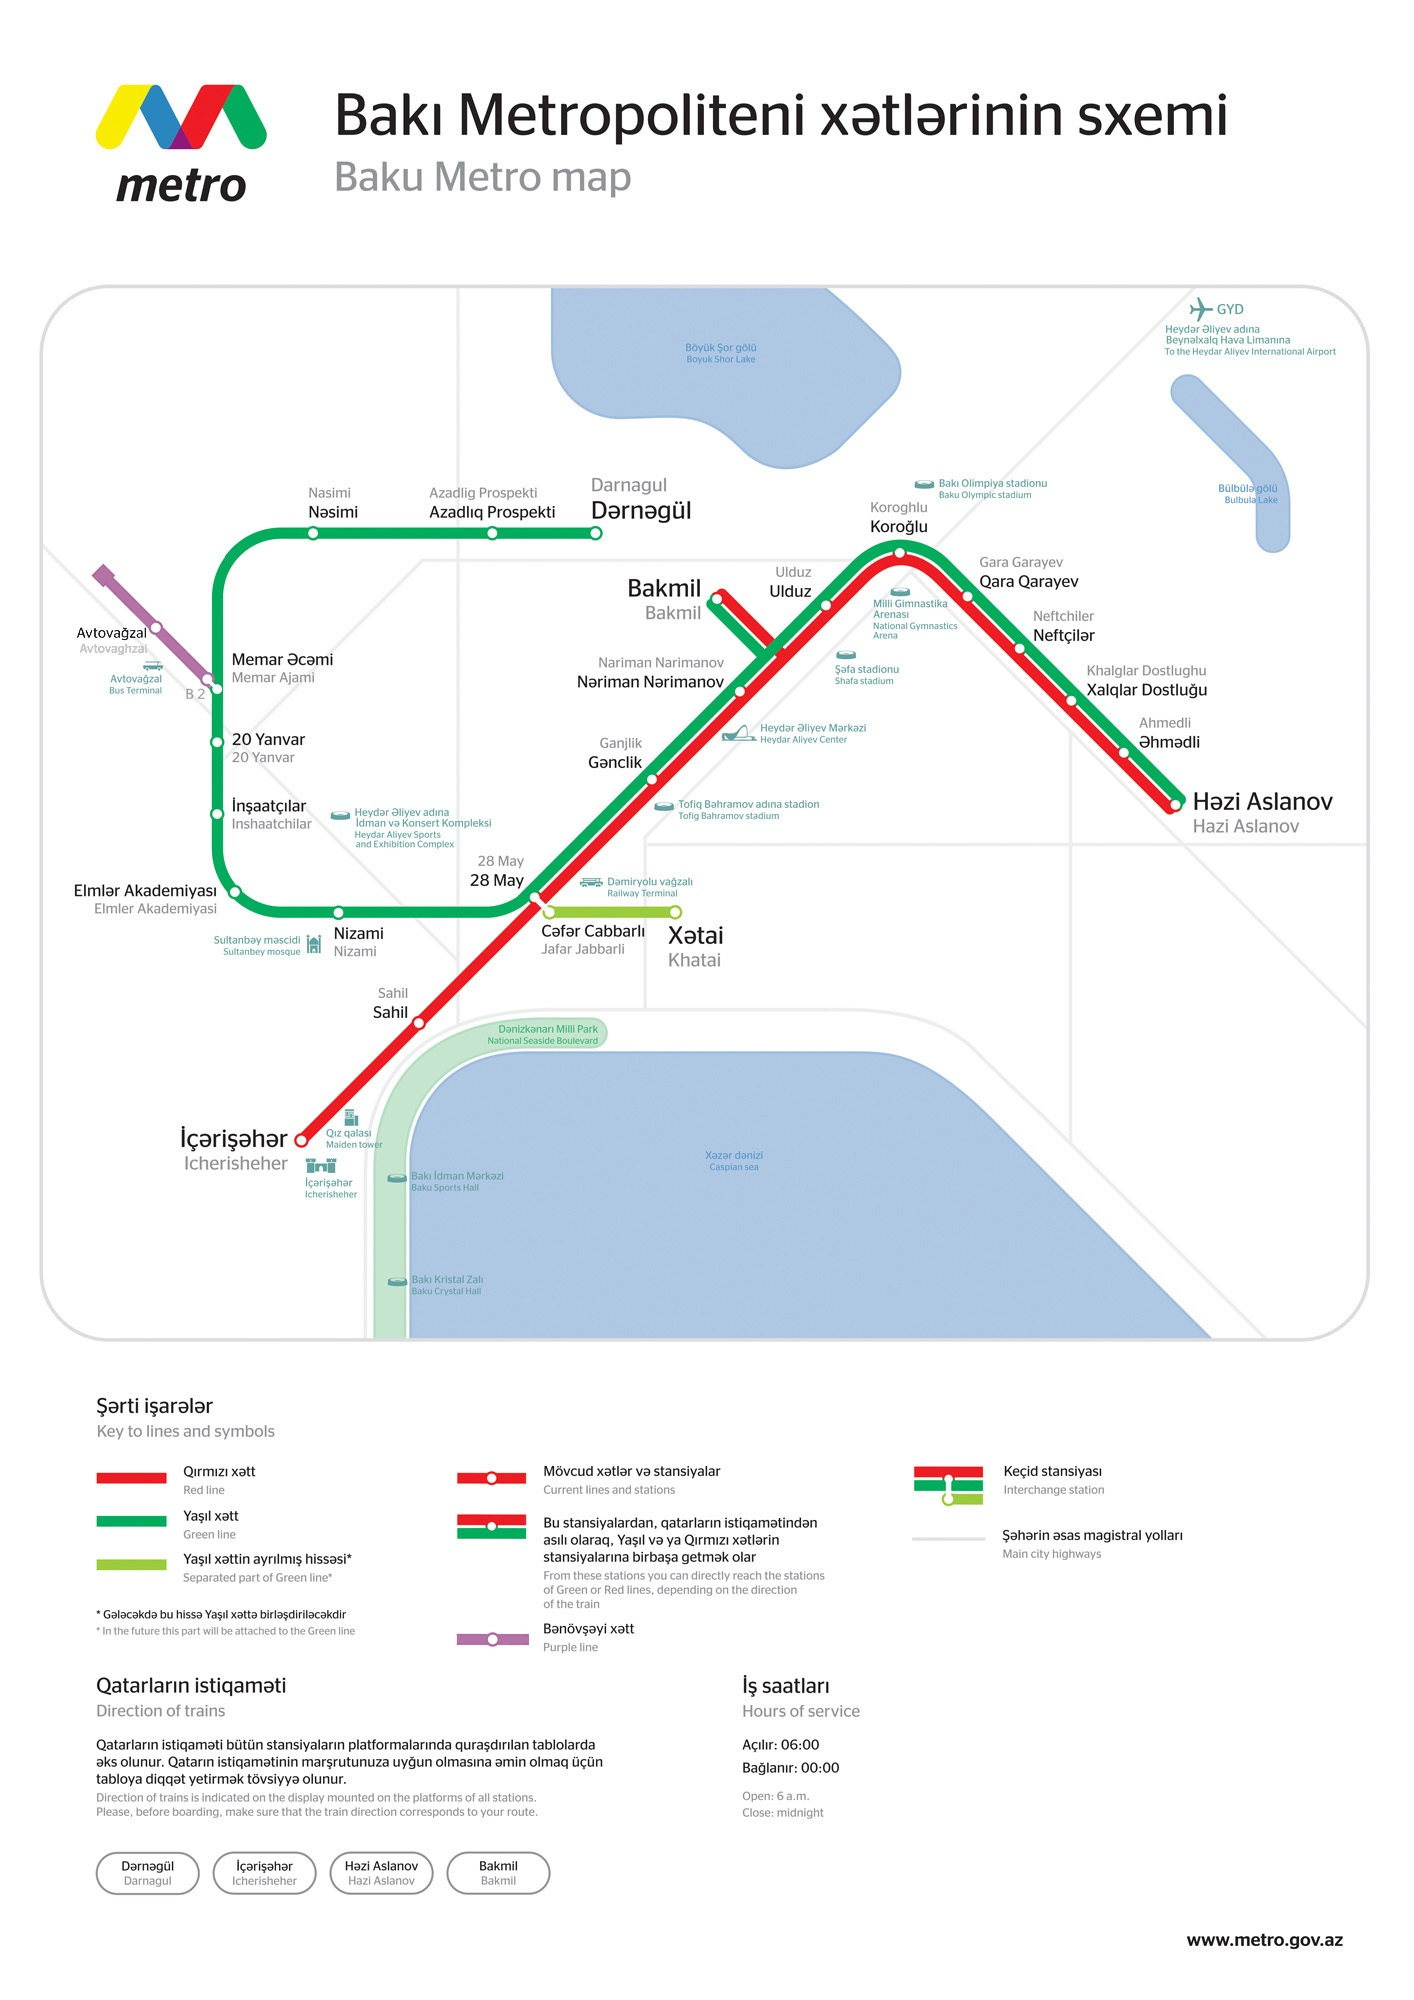 Metro Map 2016.File Baku Metro Map 2016 Jpg Wikimedia Commons